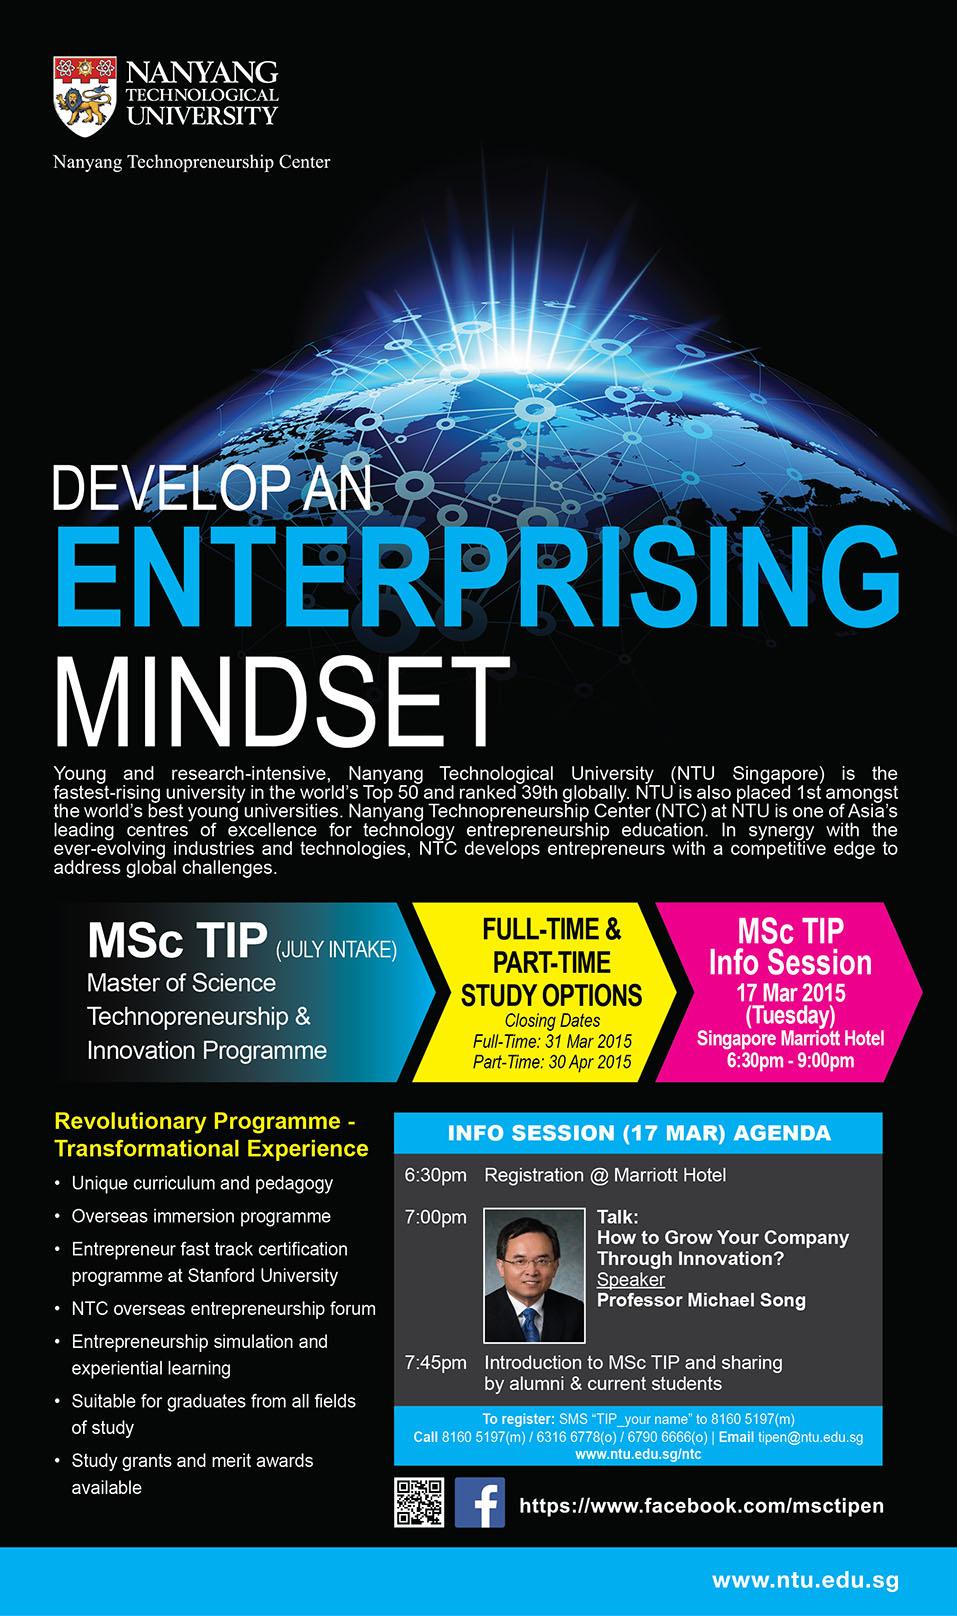 MSc TIP Info Session